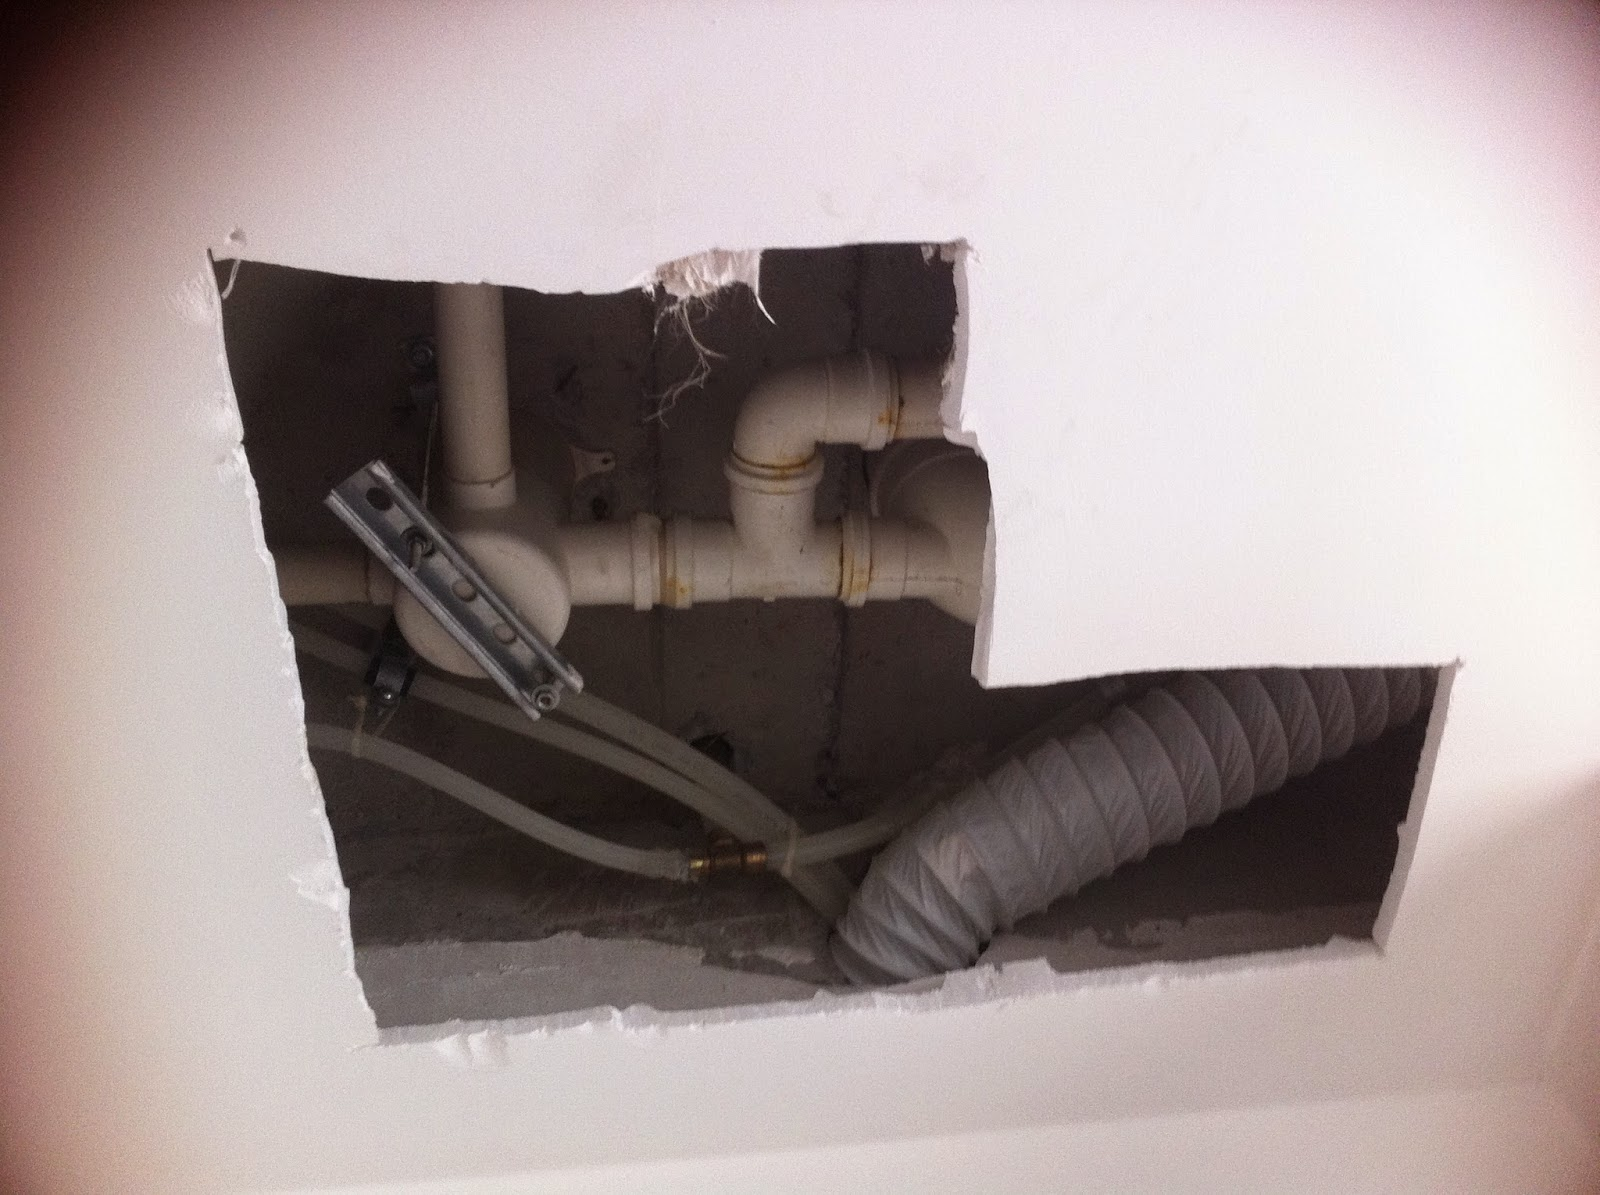 Posted in: banheiro construtora dicas reforma #795D52 1600 1195